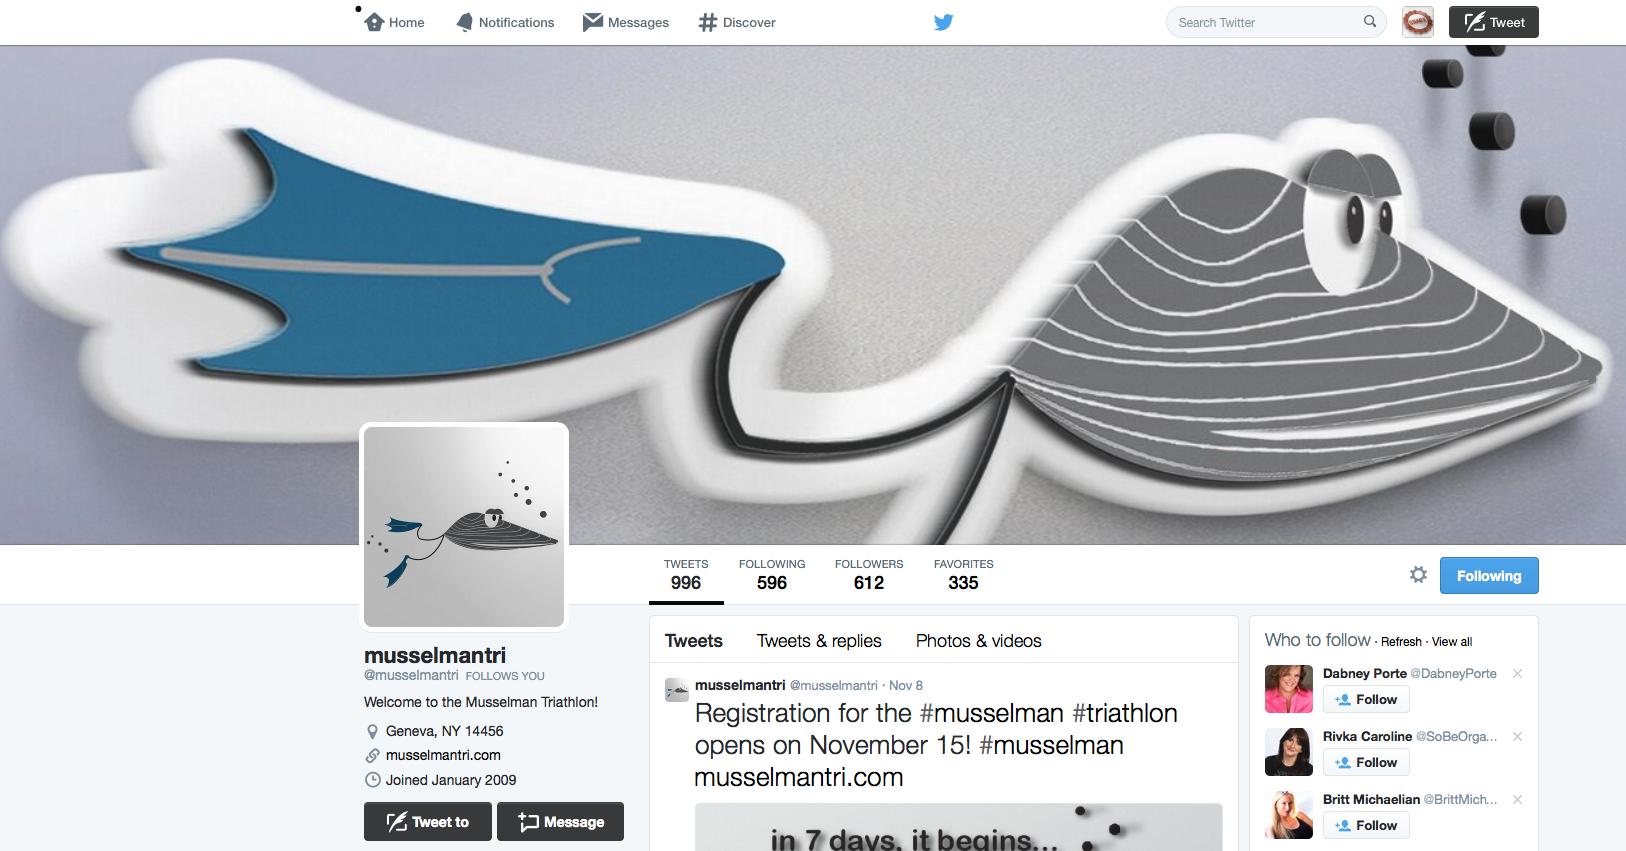 Musselman Triathlon via Twitter